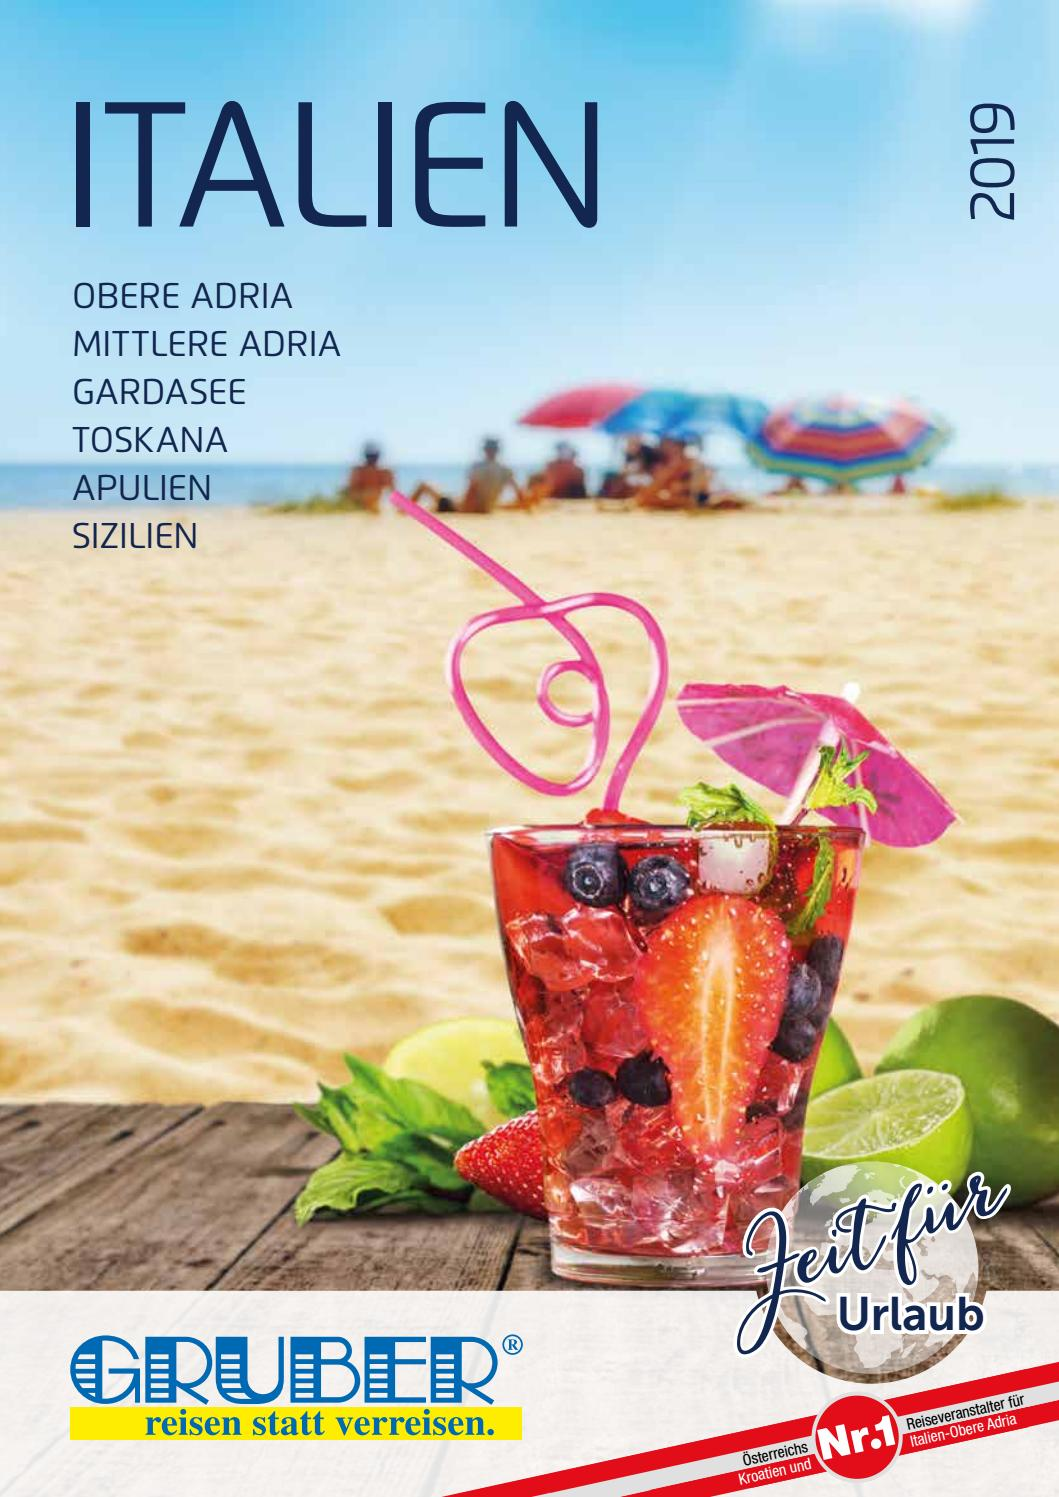 Italien Obere Adria Karte.Gruber Reisen Italien Katalog 2019 By Gruber Reisen Issuu